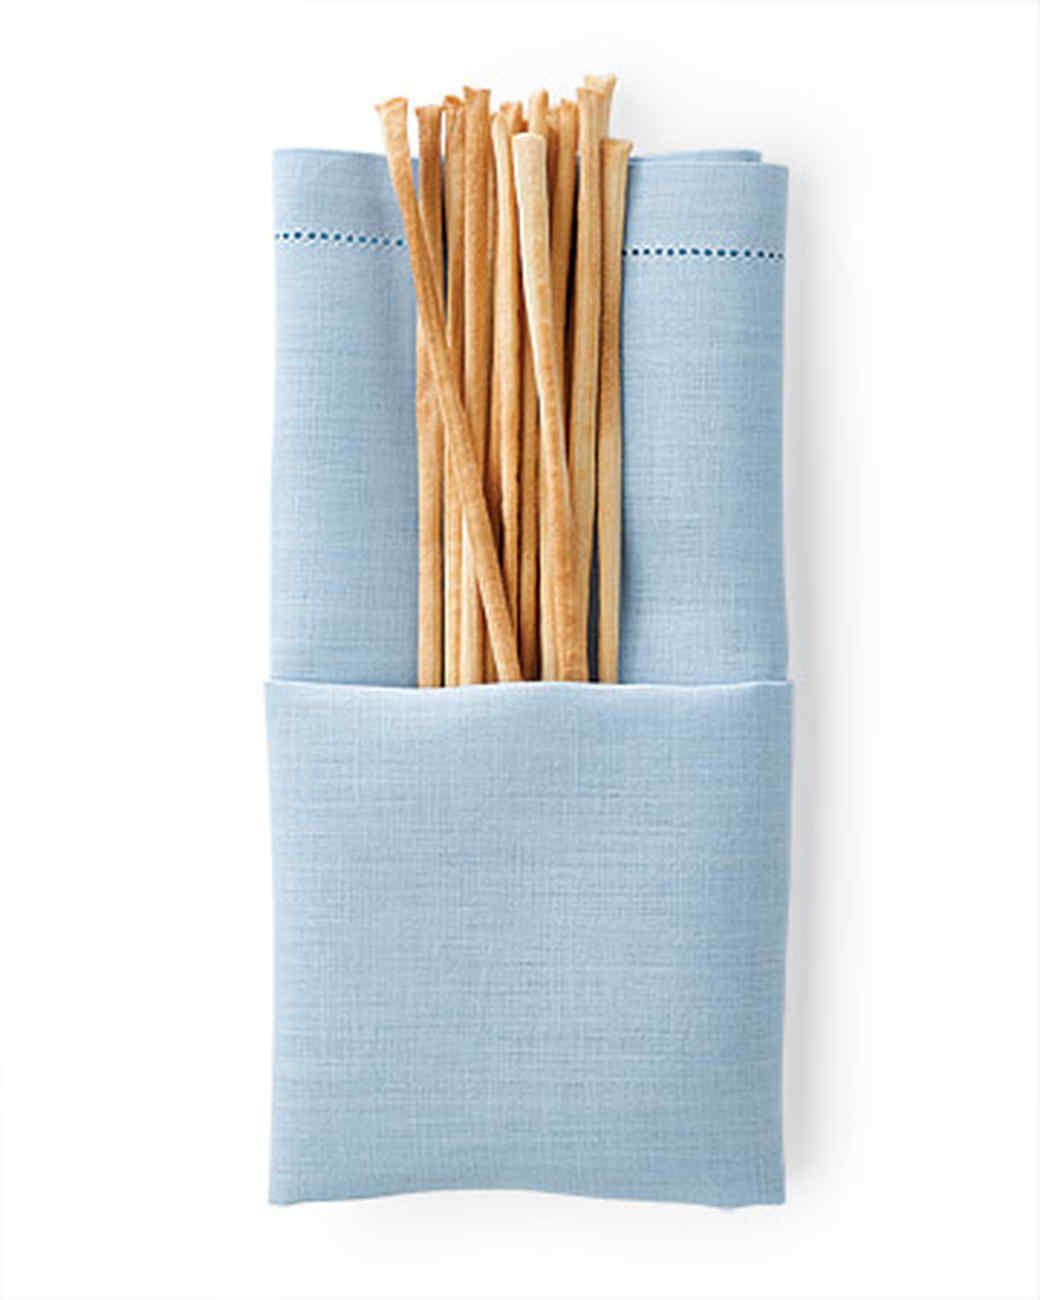 Napkin Folding Ideas For Weddings: How To Fold A Napkin In 10 Beautiful Ways